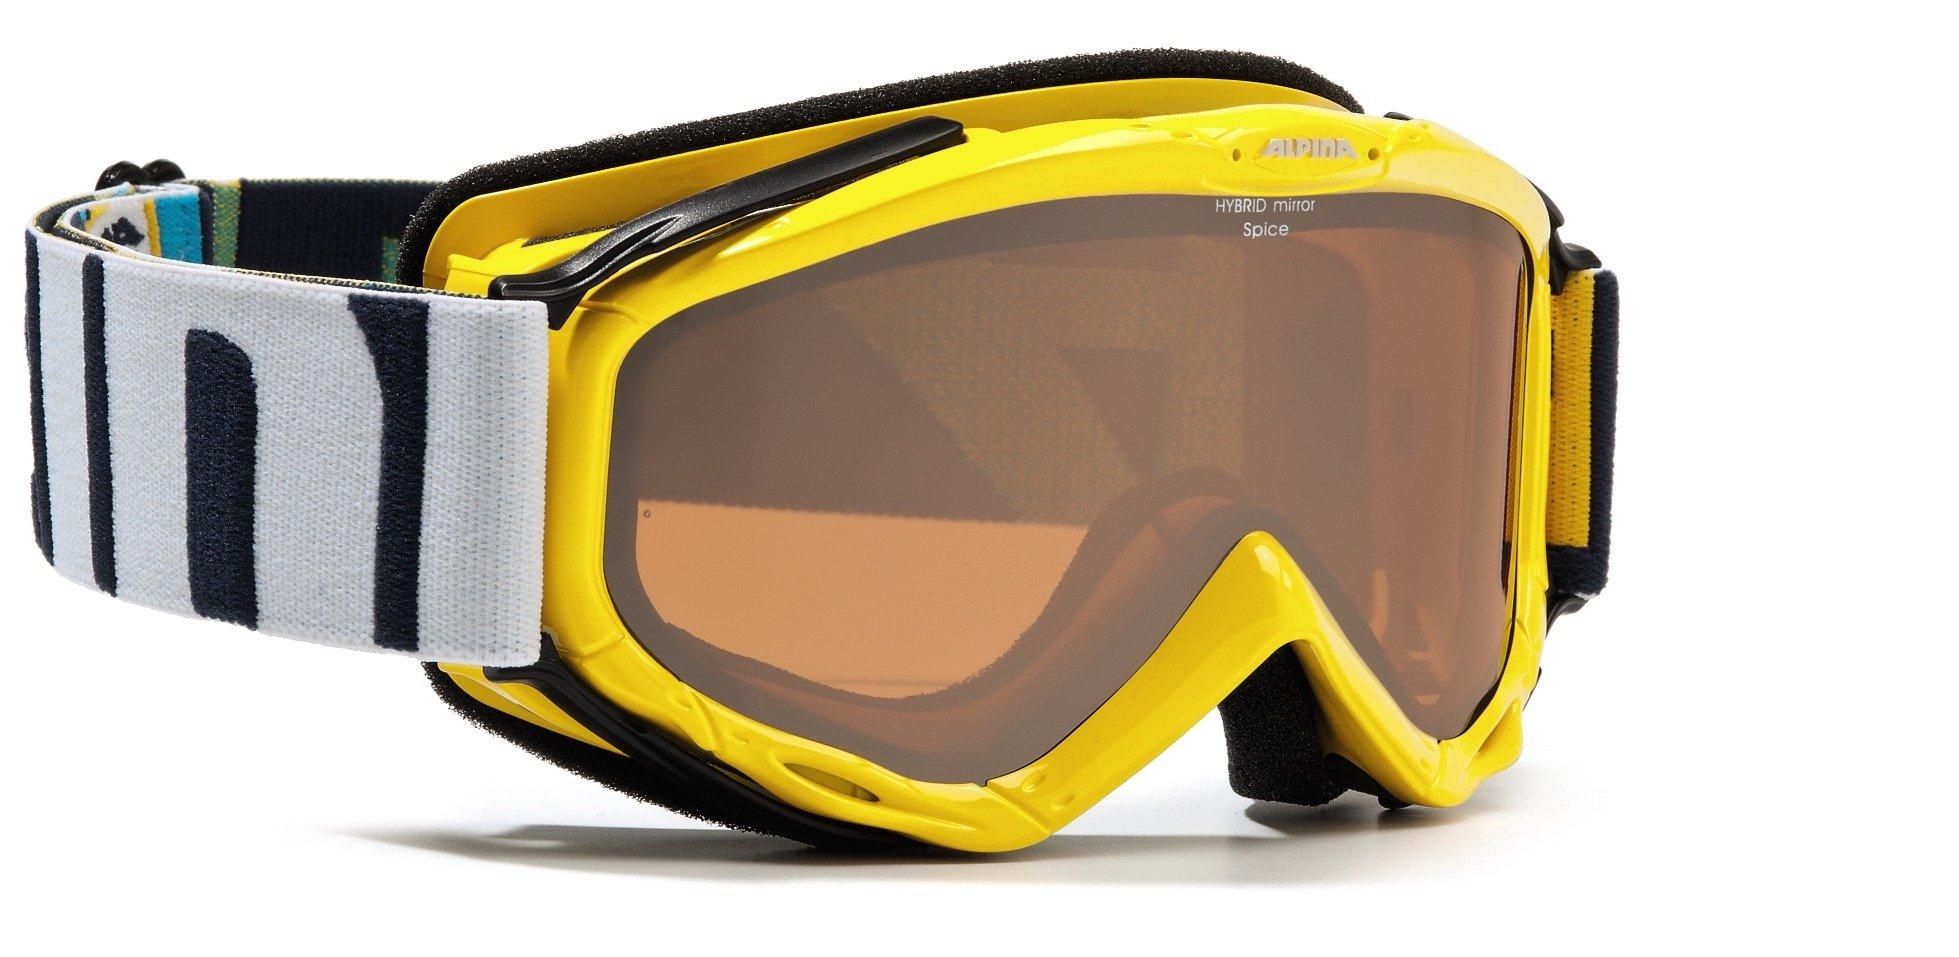 Alpina spice hybrid mirror skibriller fra Alpina på billigsport24